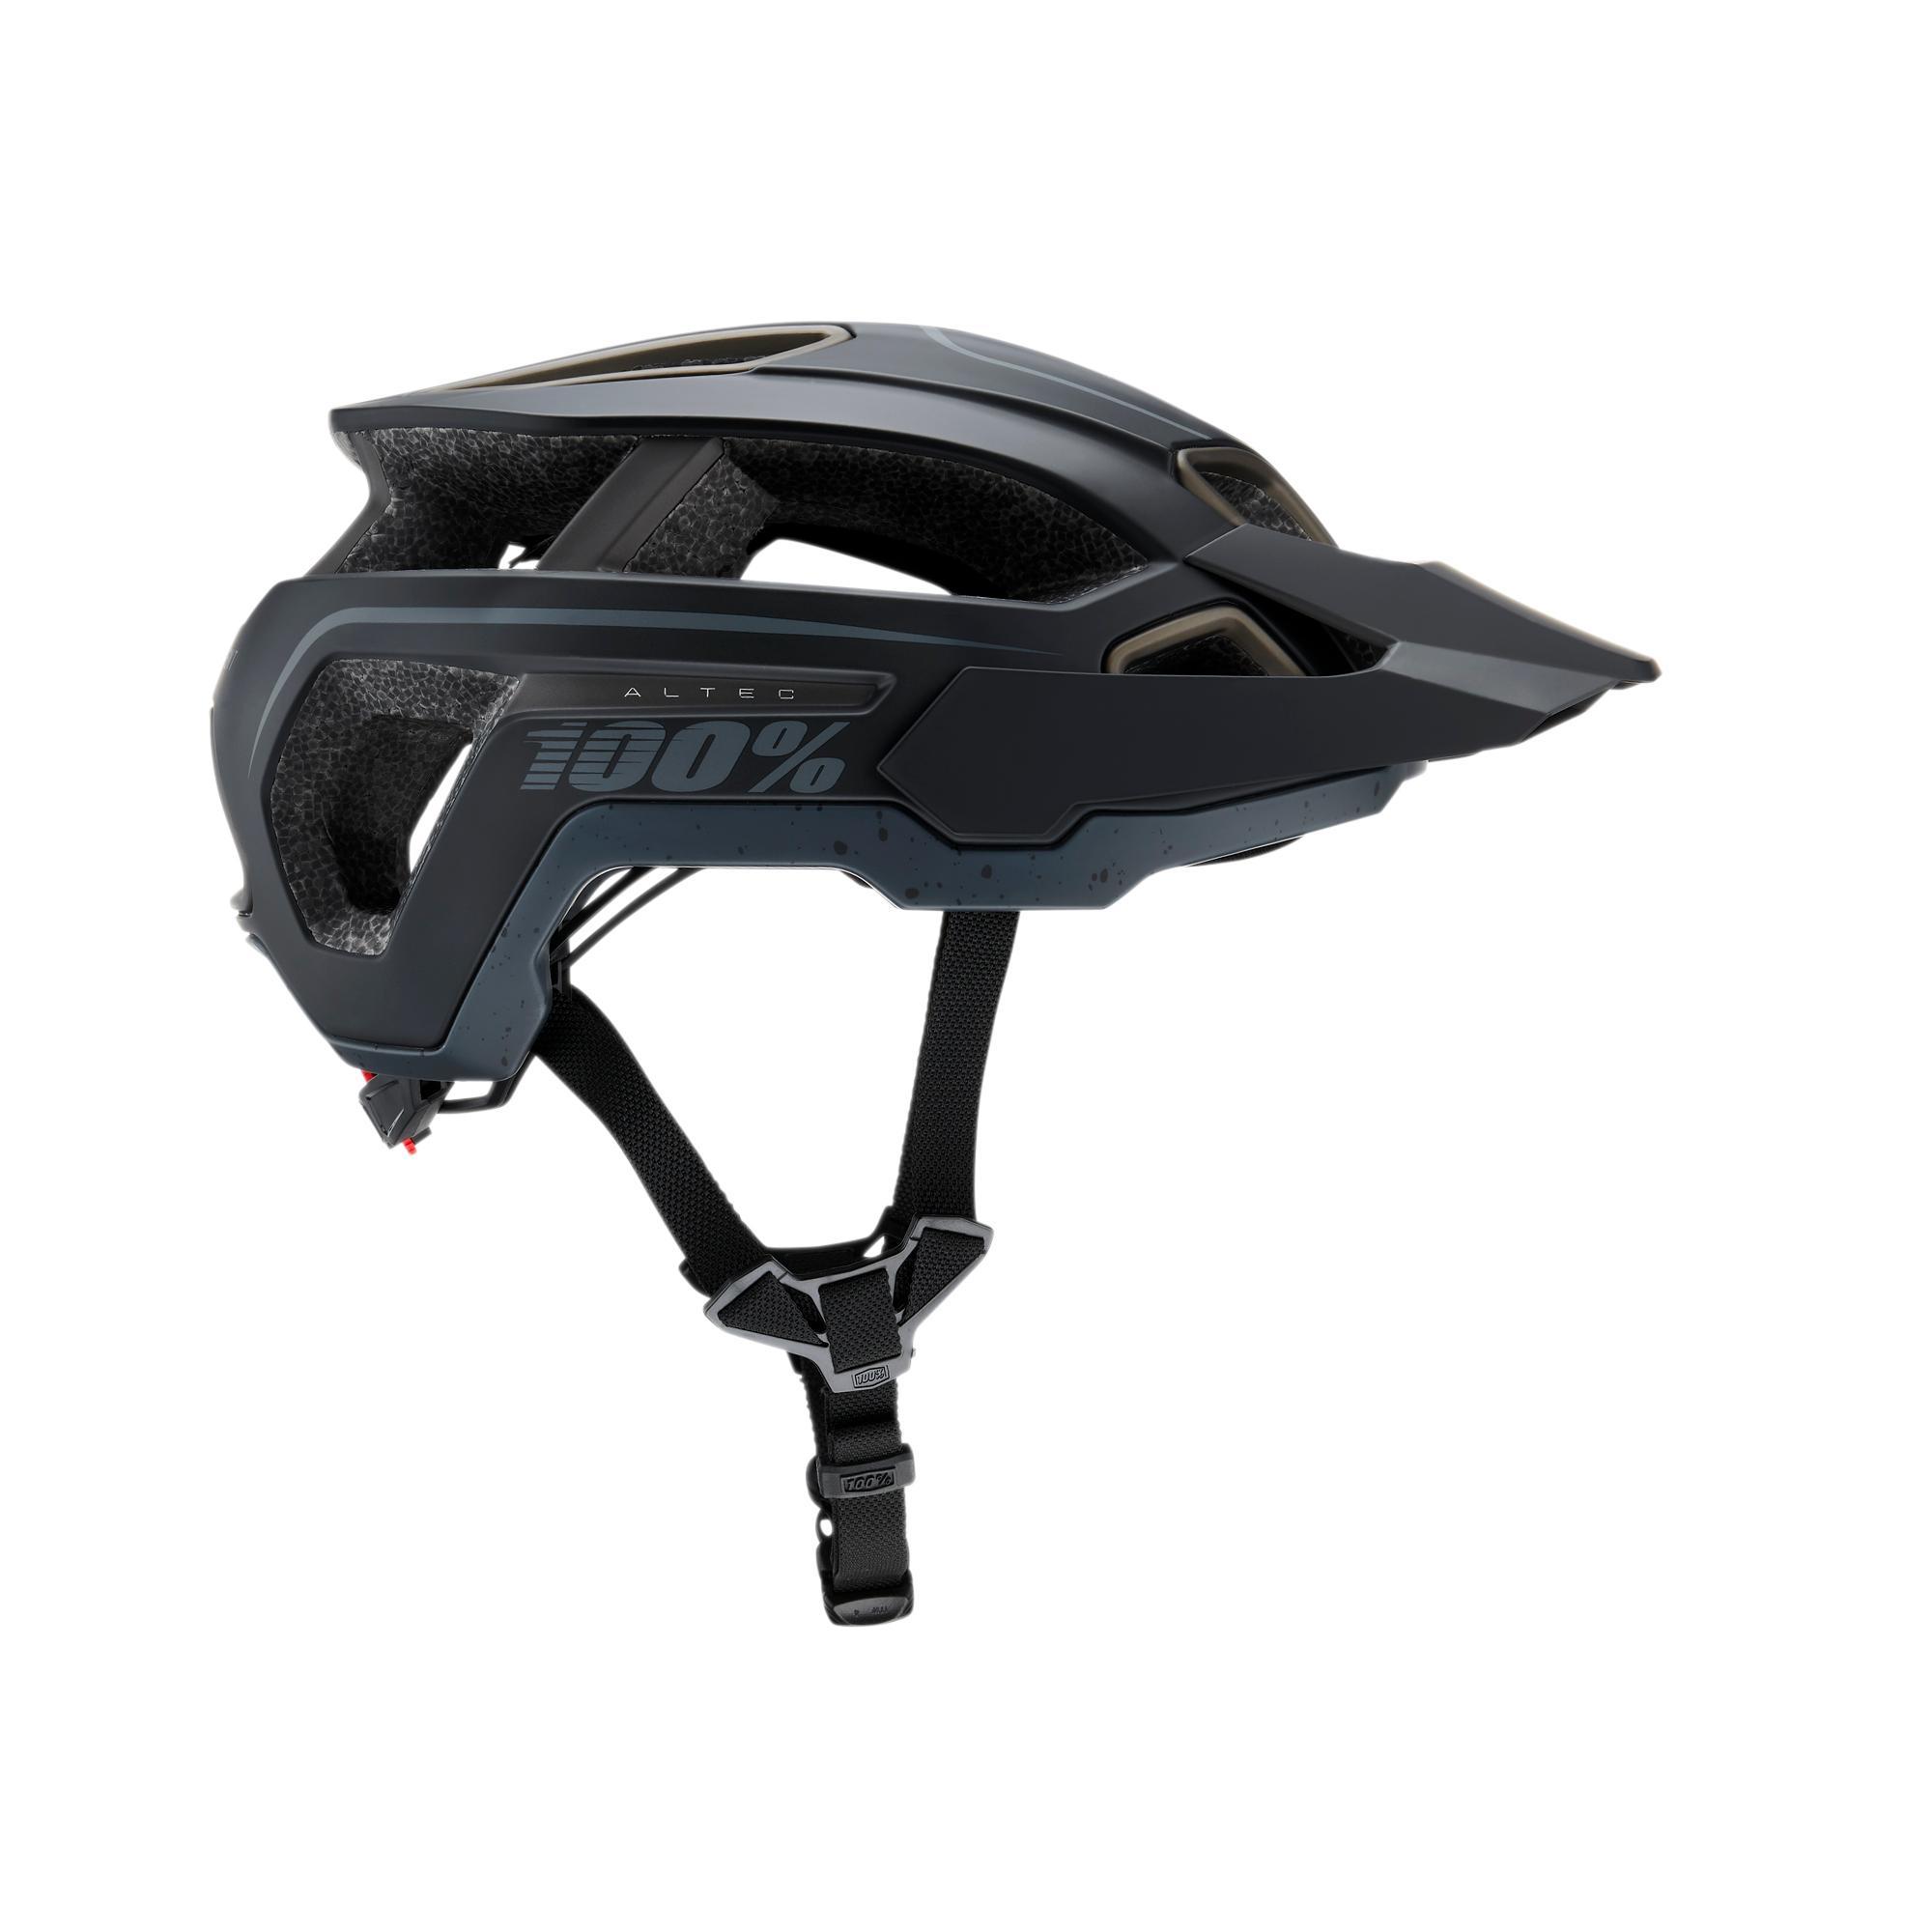 ALTEC Helmet Black